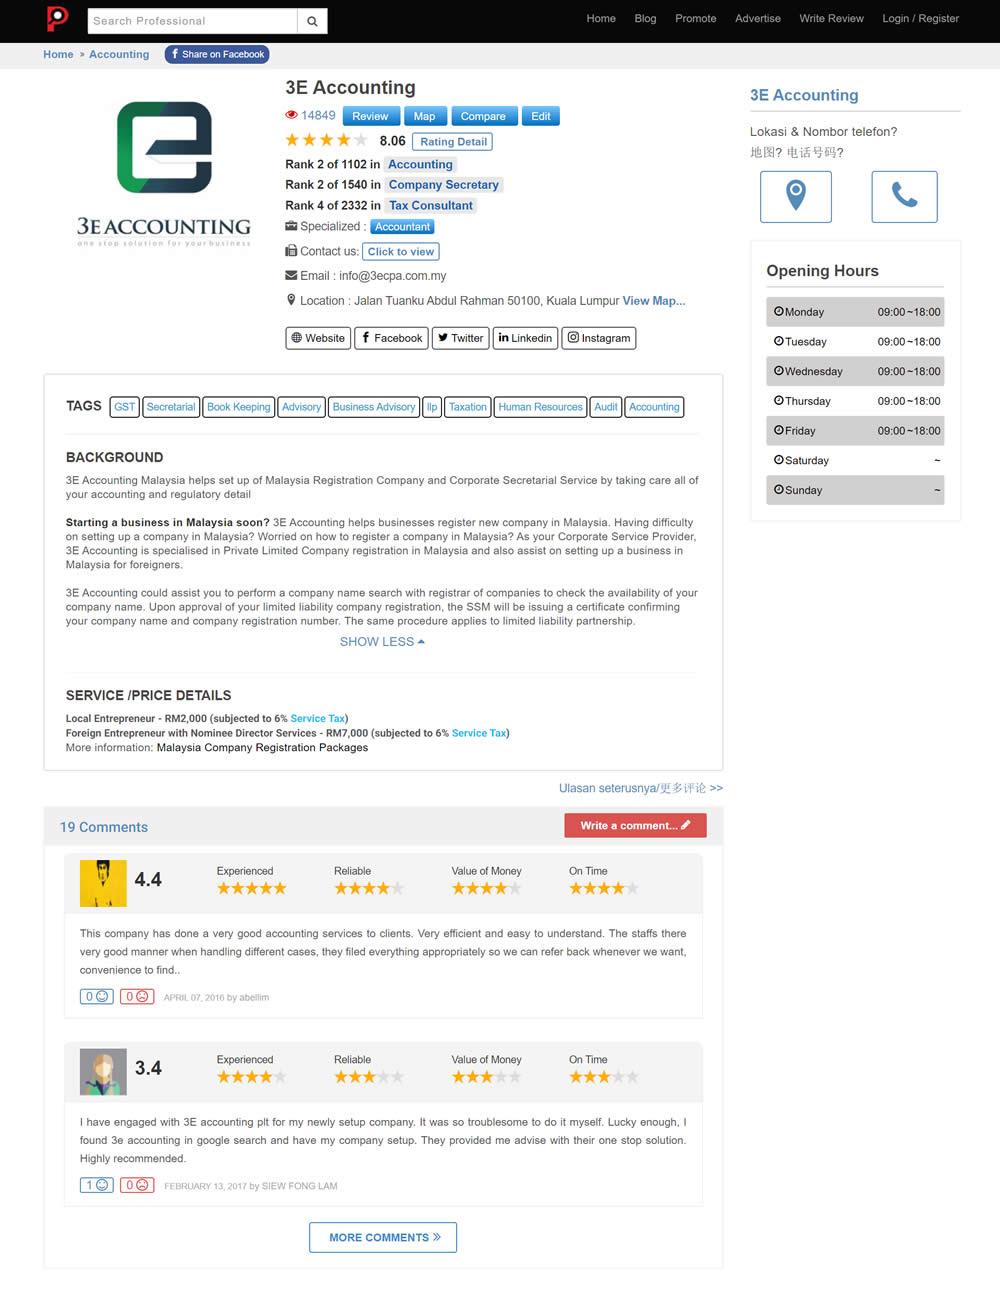 3E Accounting Malaysia Lookp Reviews